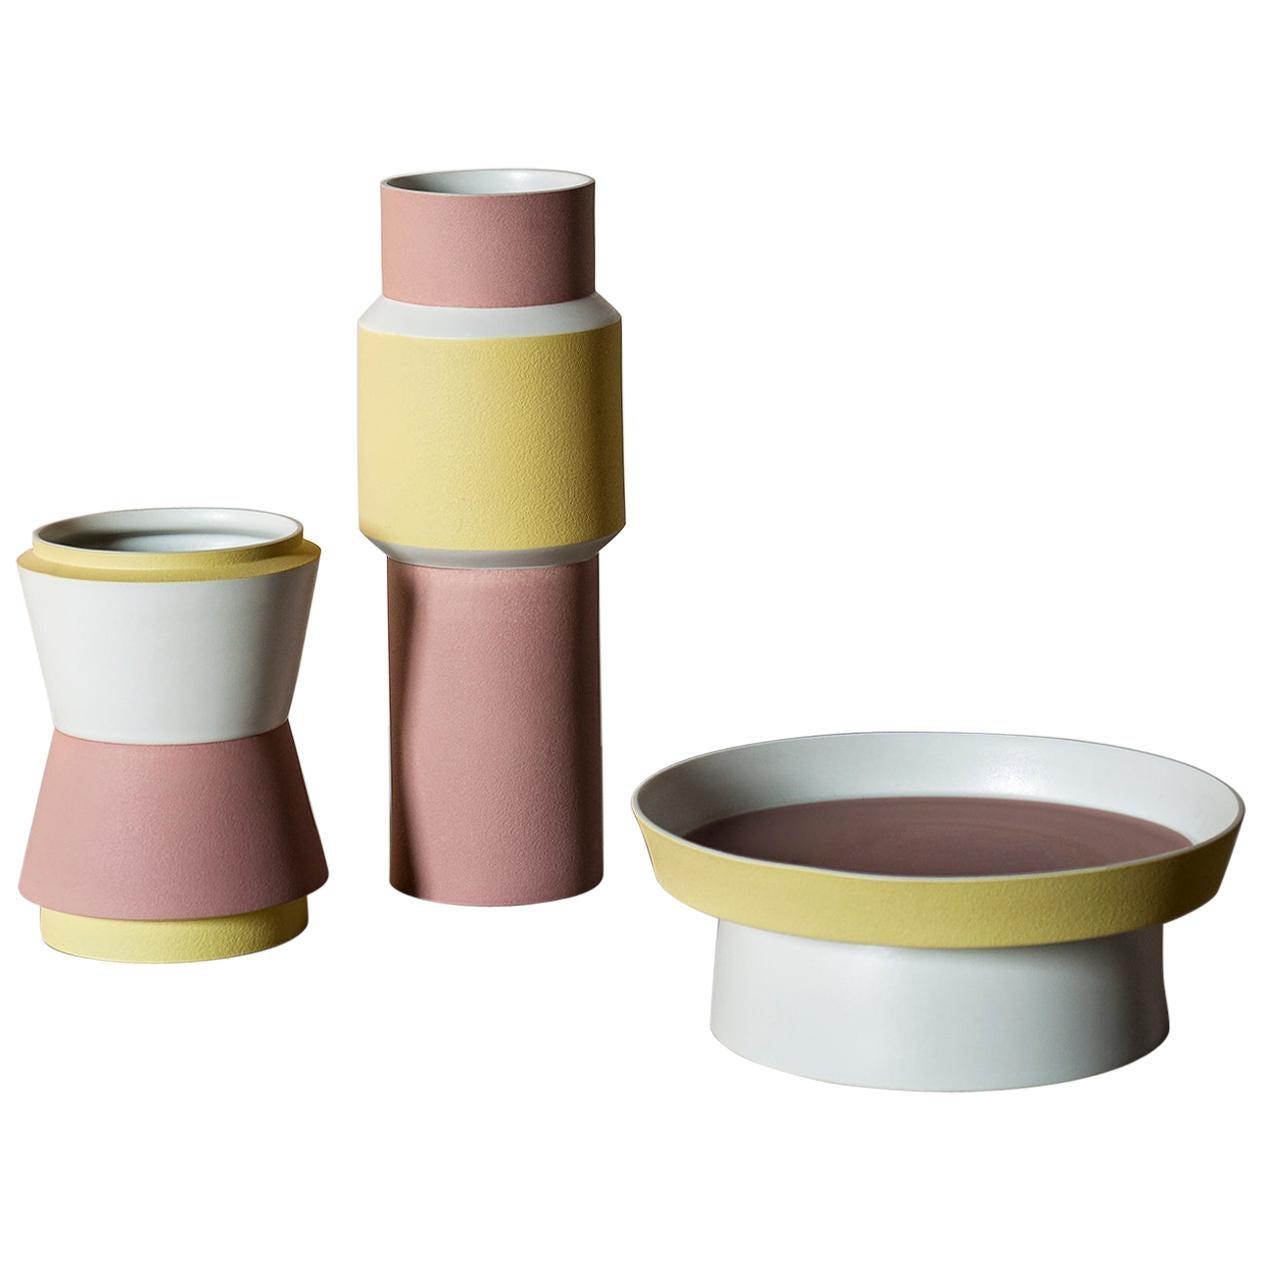 Tacchini Vasum Medium Yellow/Pink Vase in Porcelain by Maria Gabriella Zecca